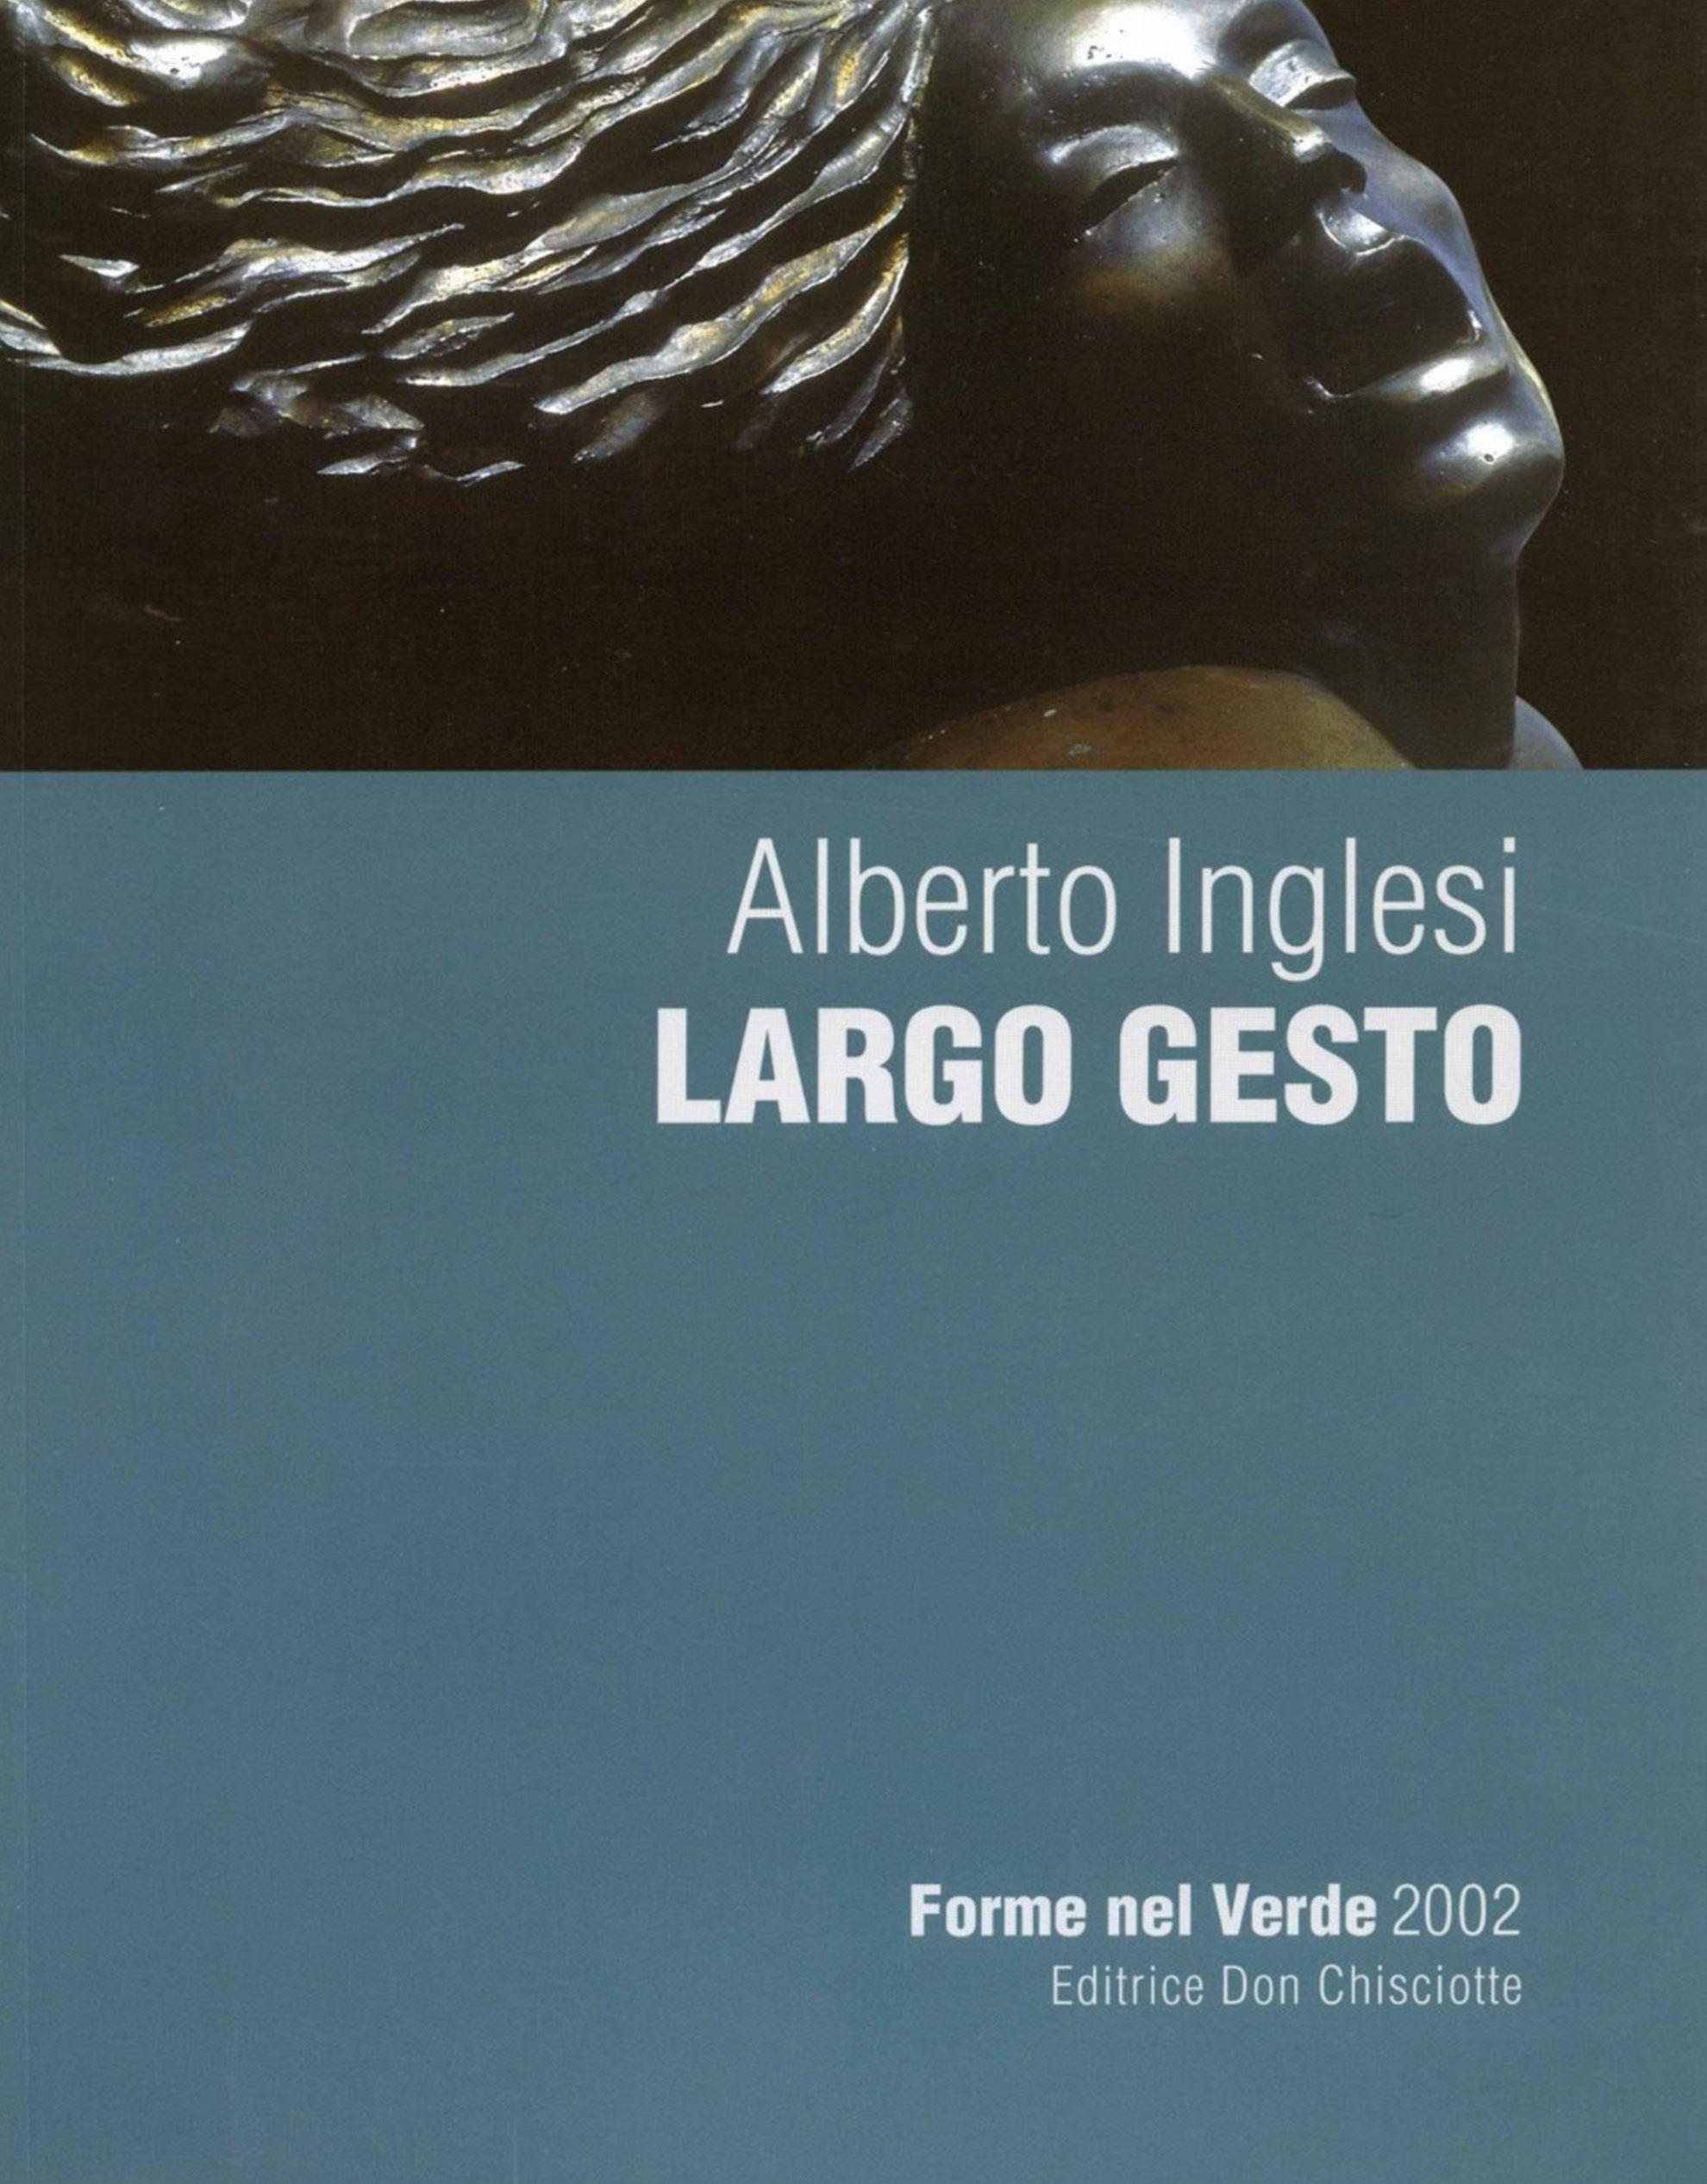 Catalogo Forme nel Verde 2002